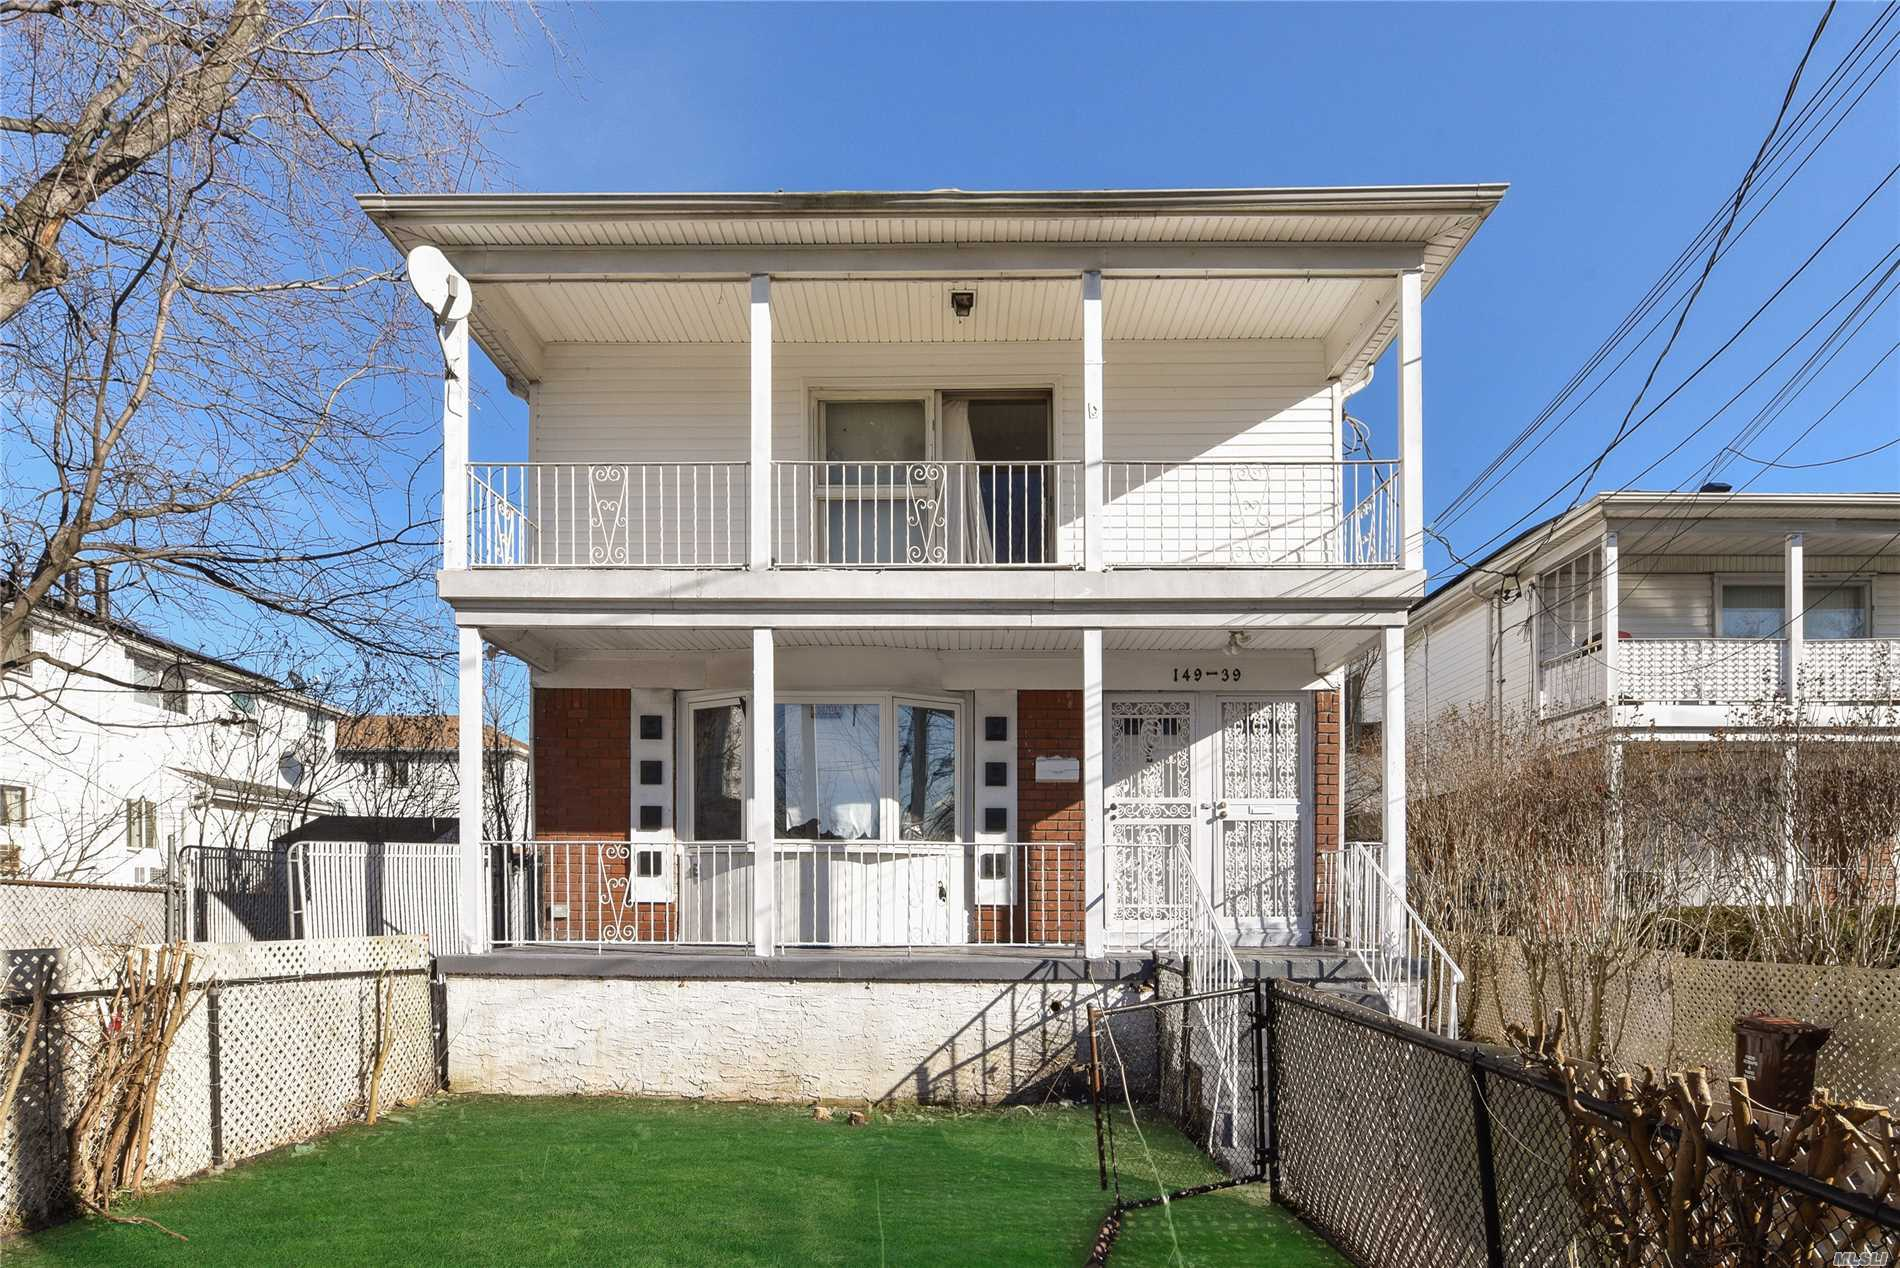 149-39 Huxley St Rosedale, NY 11422